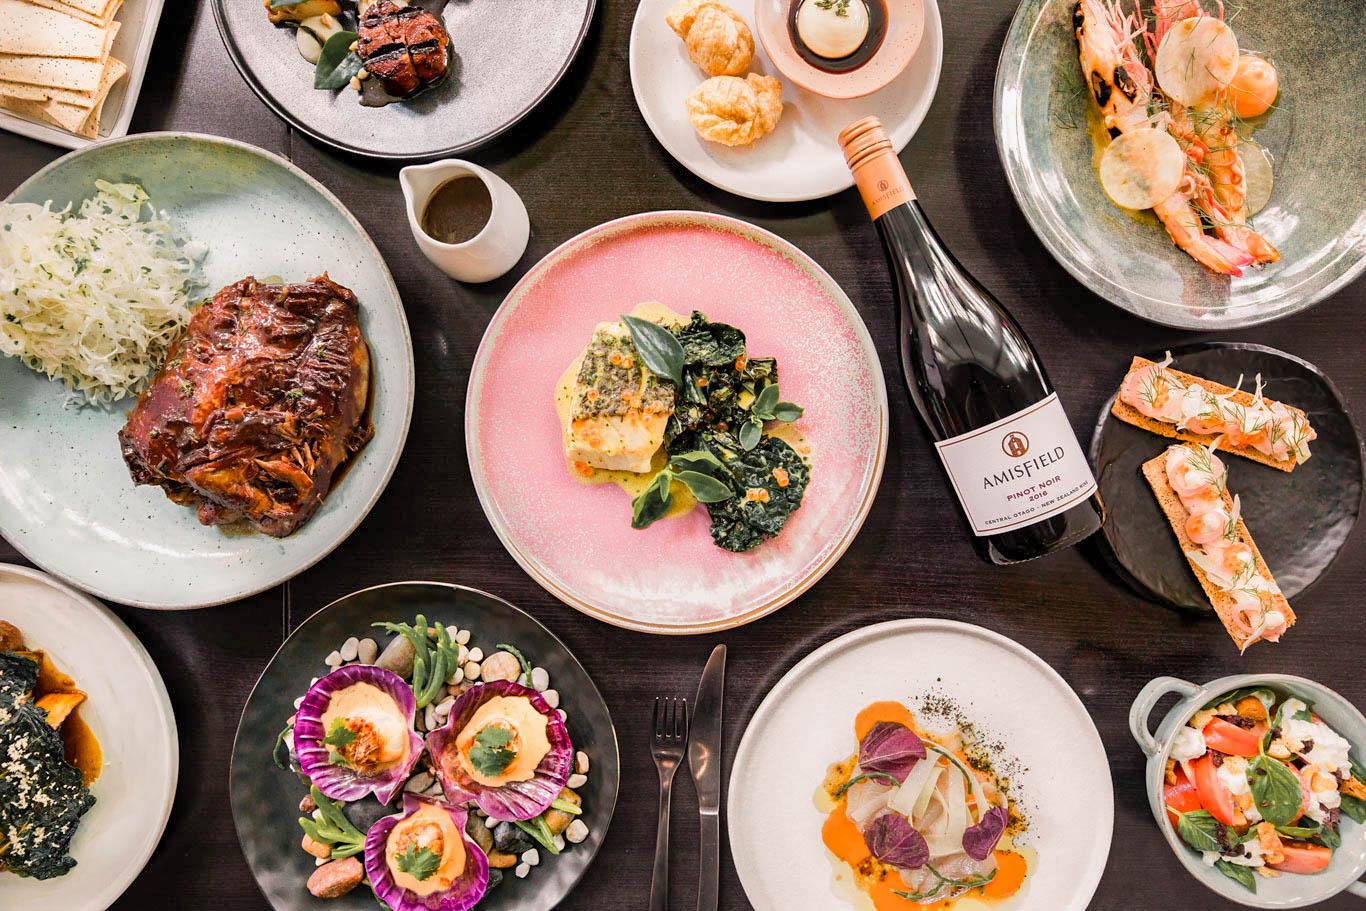 broadbeach best restaurant hotel avani kelseyinlondon kelsey heinrichs what to do in broadbeach gold coast best places social eating house